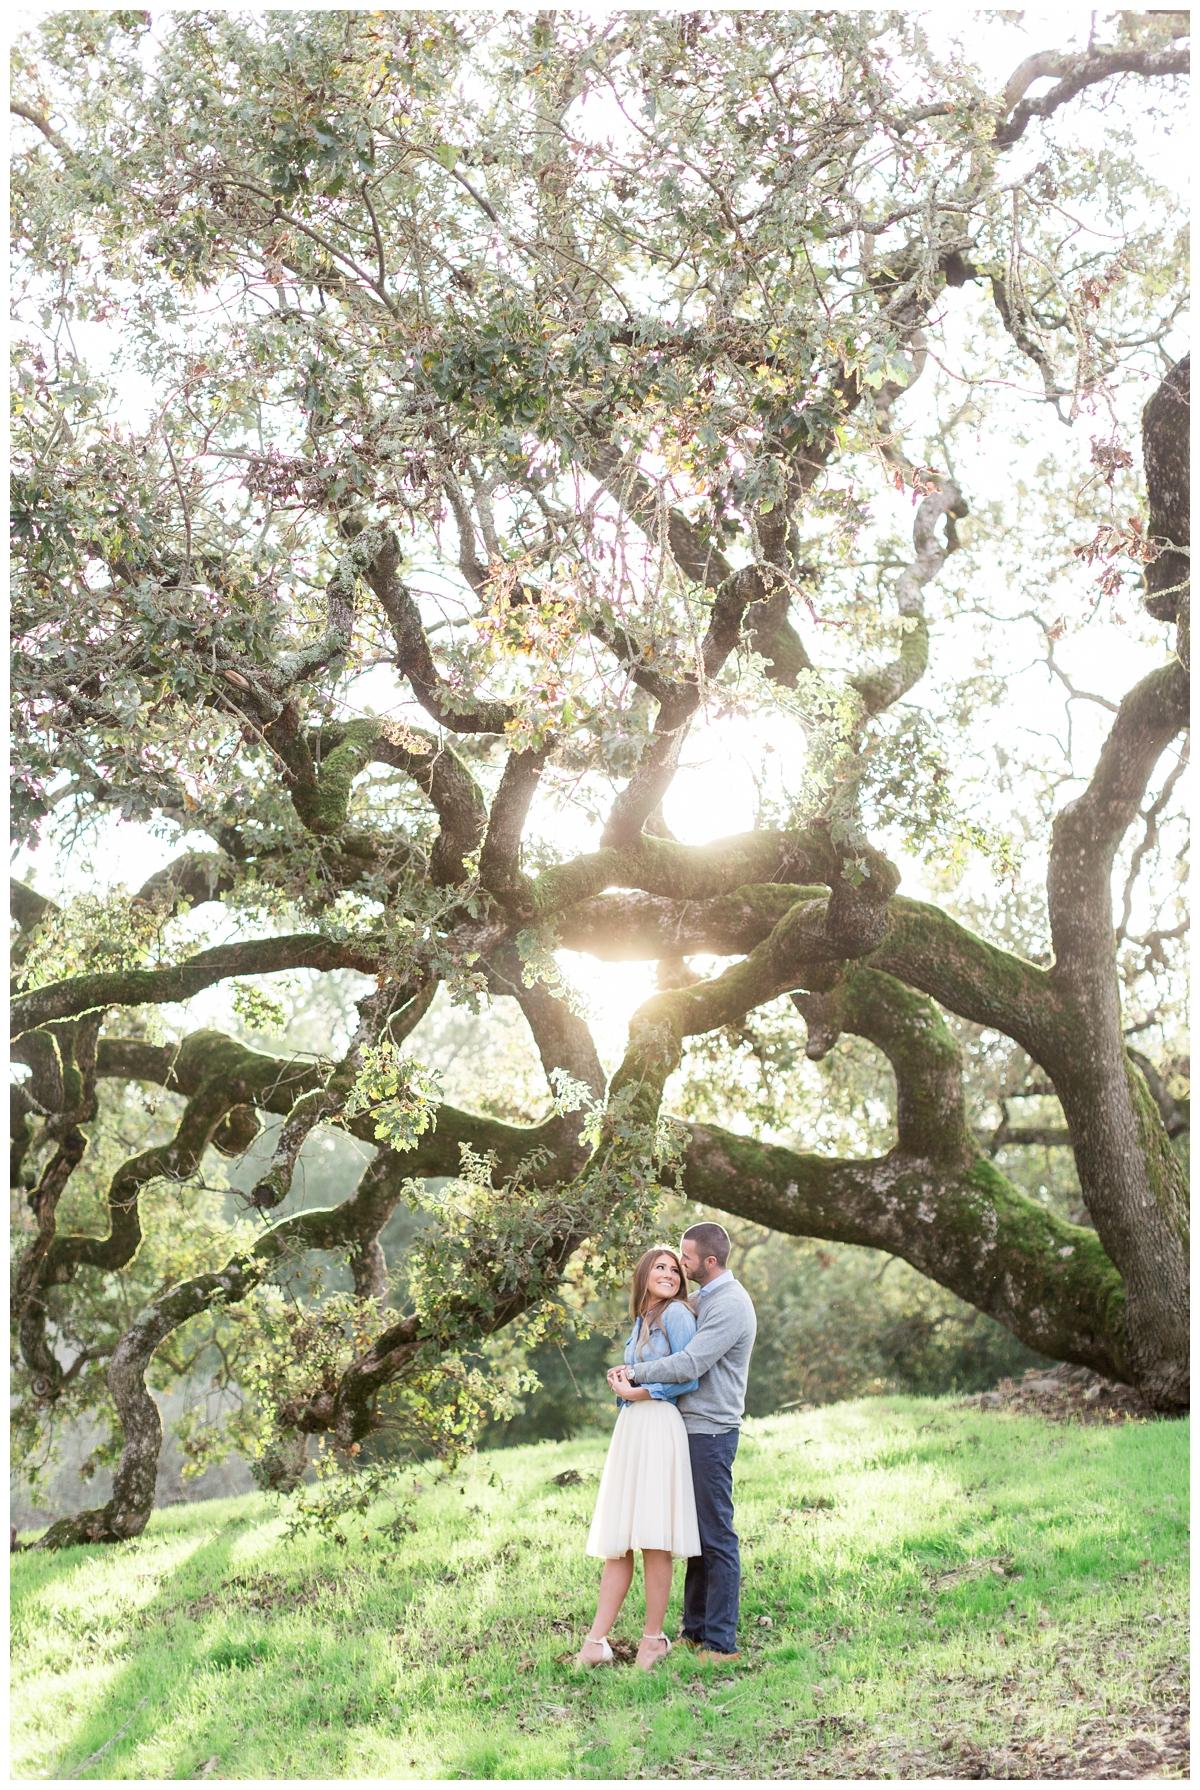 Crane Creek Park engagement photographer in Sonoma County